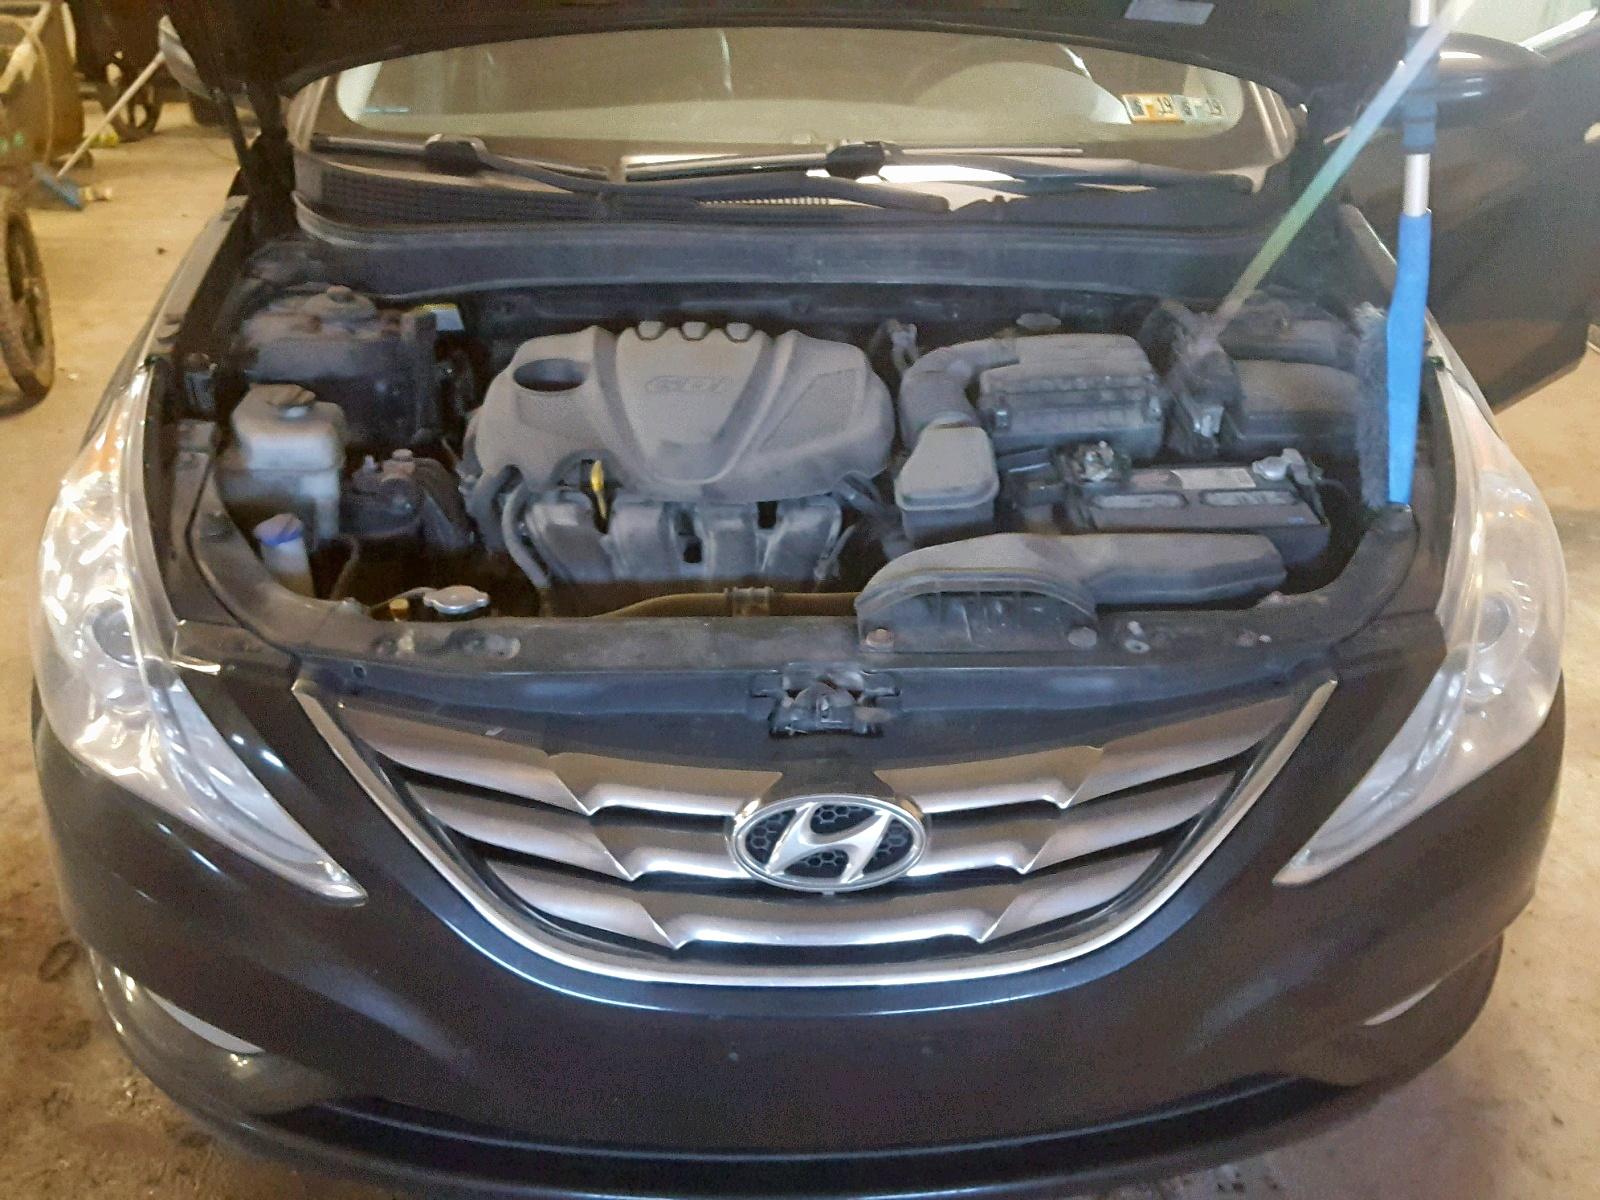 2011 Hyundai Sonata Se 2.4L inside view